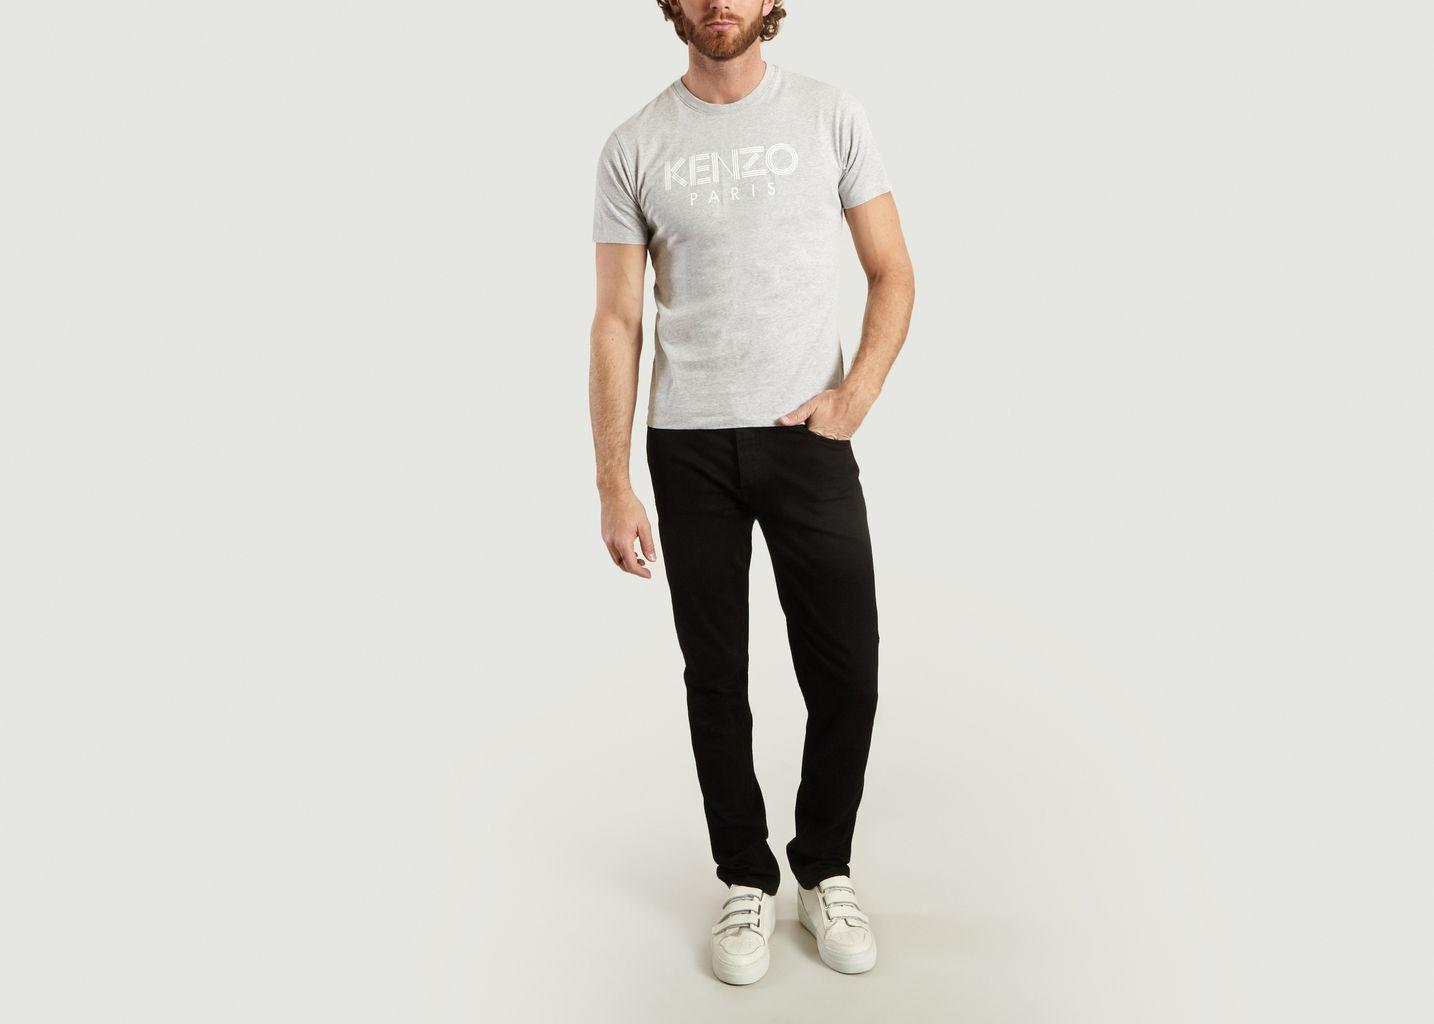 T-Shirt Kenzo Paris - Kenzo